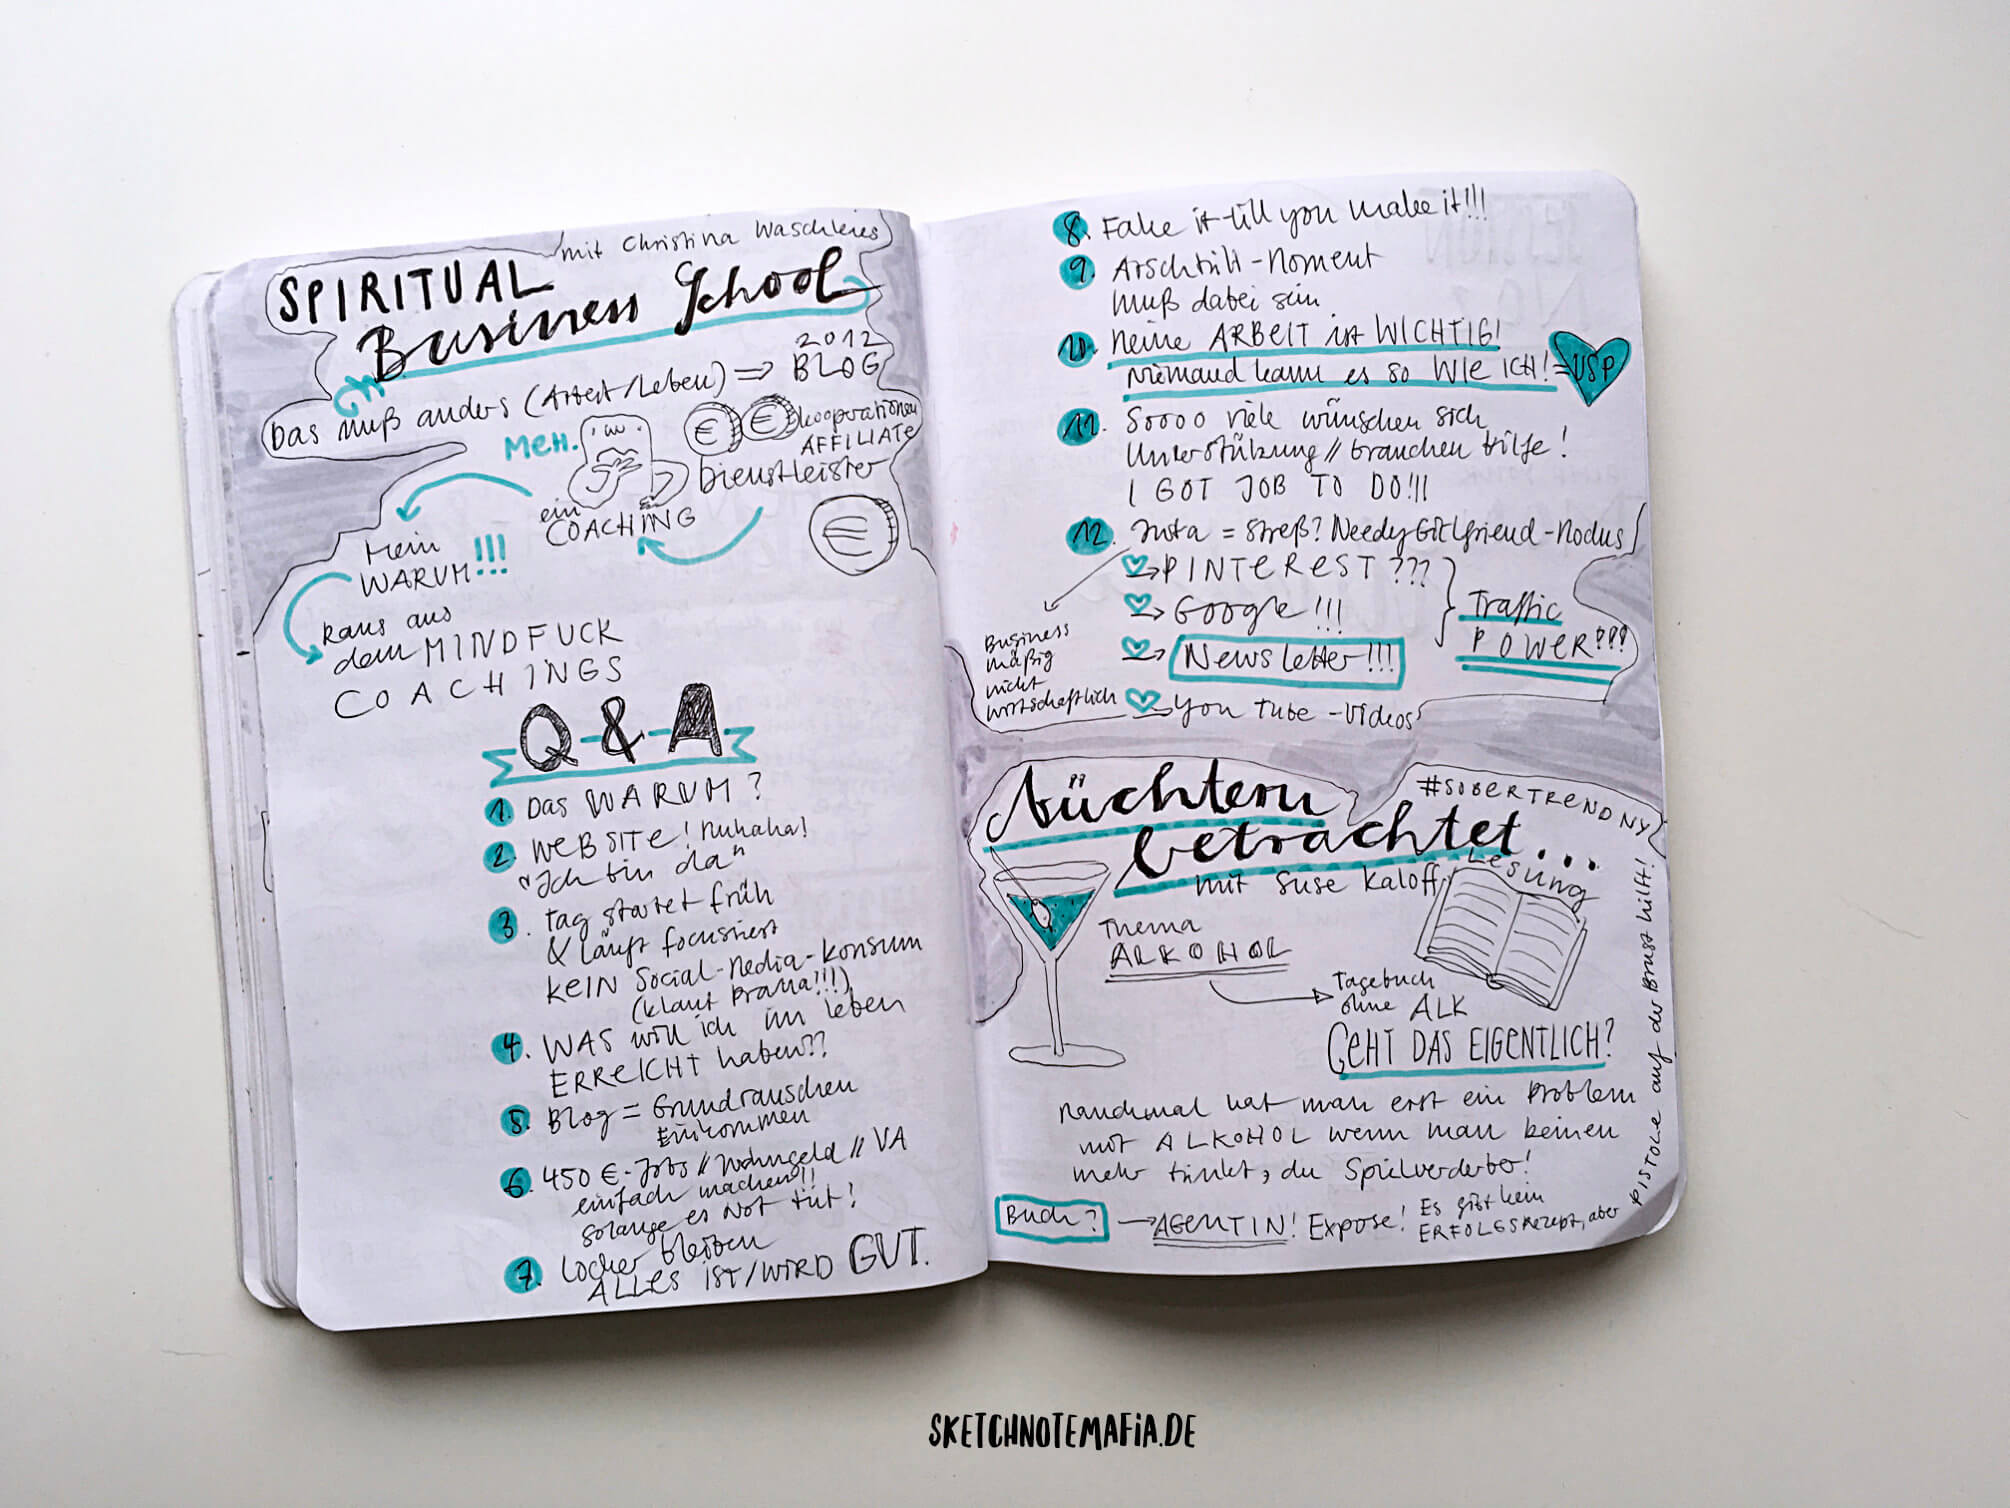 Mindful Blogging Conference - Business School